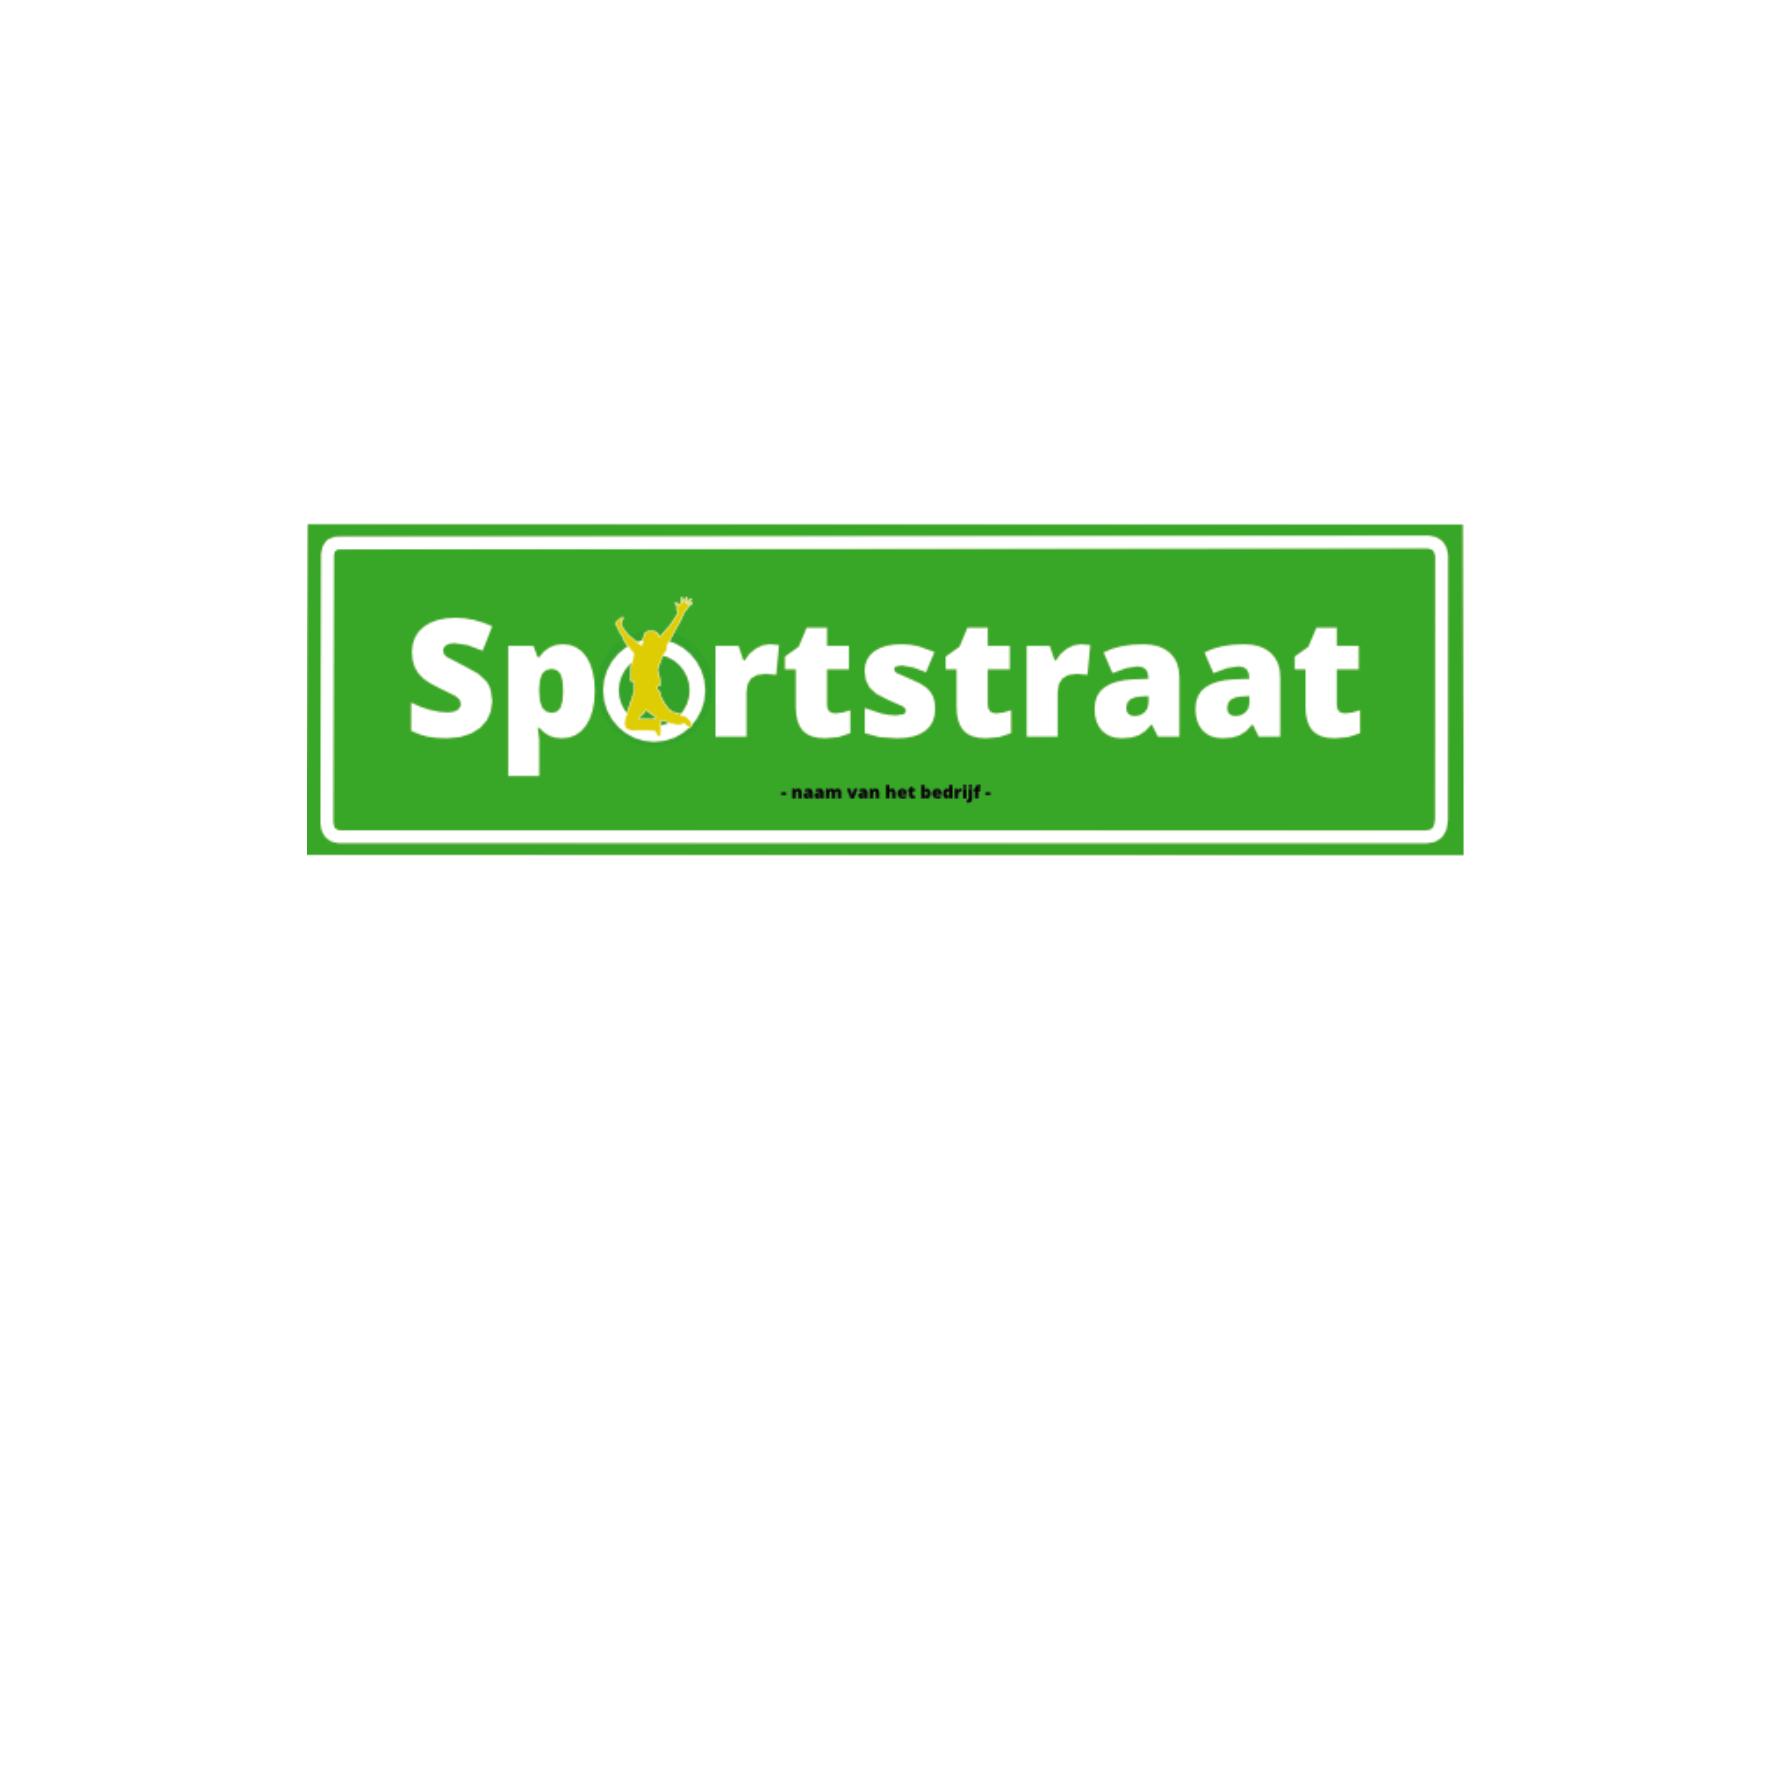 LOGO DE SPORTSTRAAT